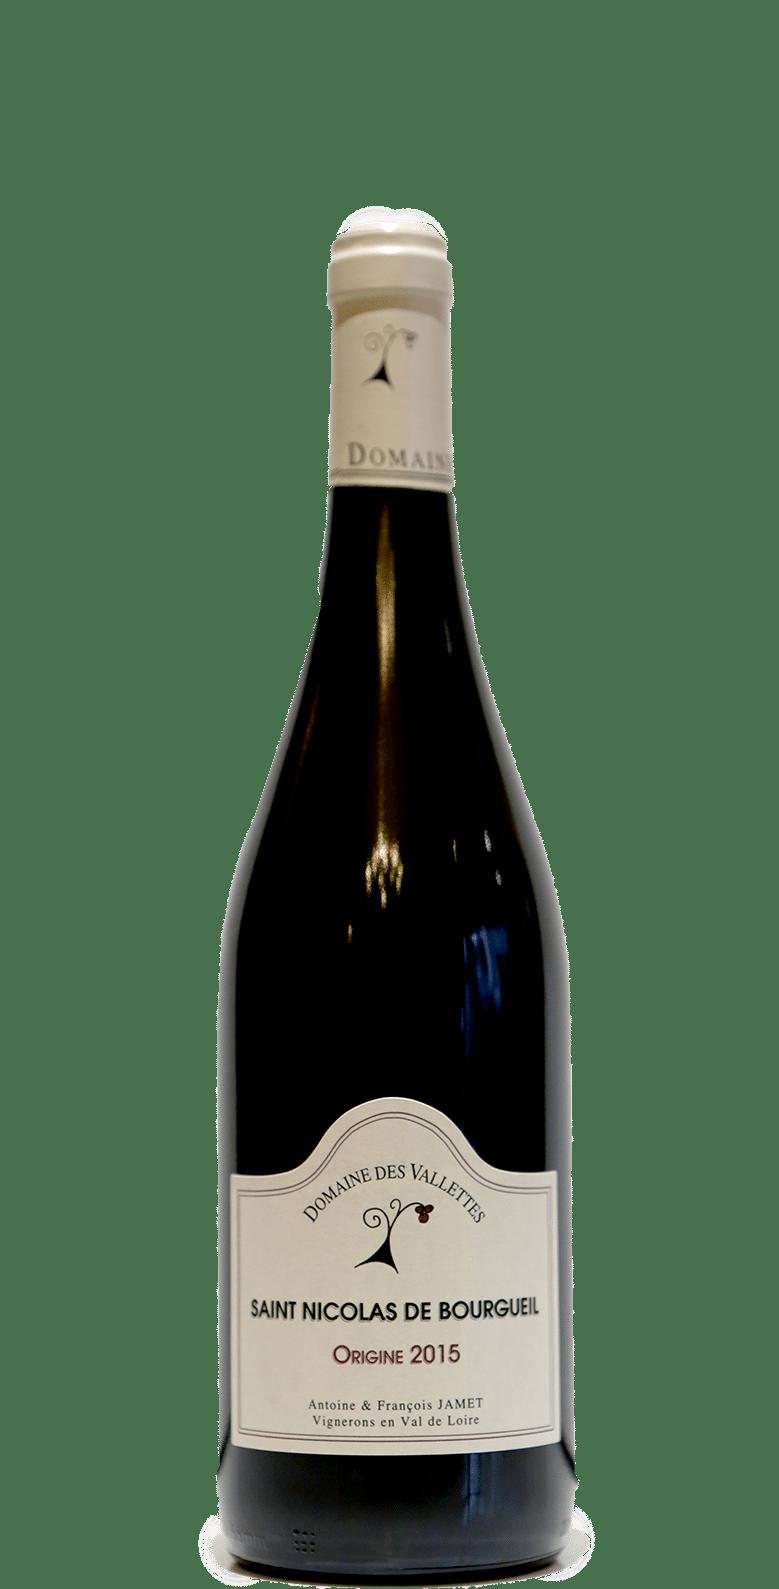 509-saintnicolasdebourgueil